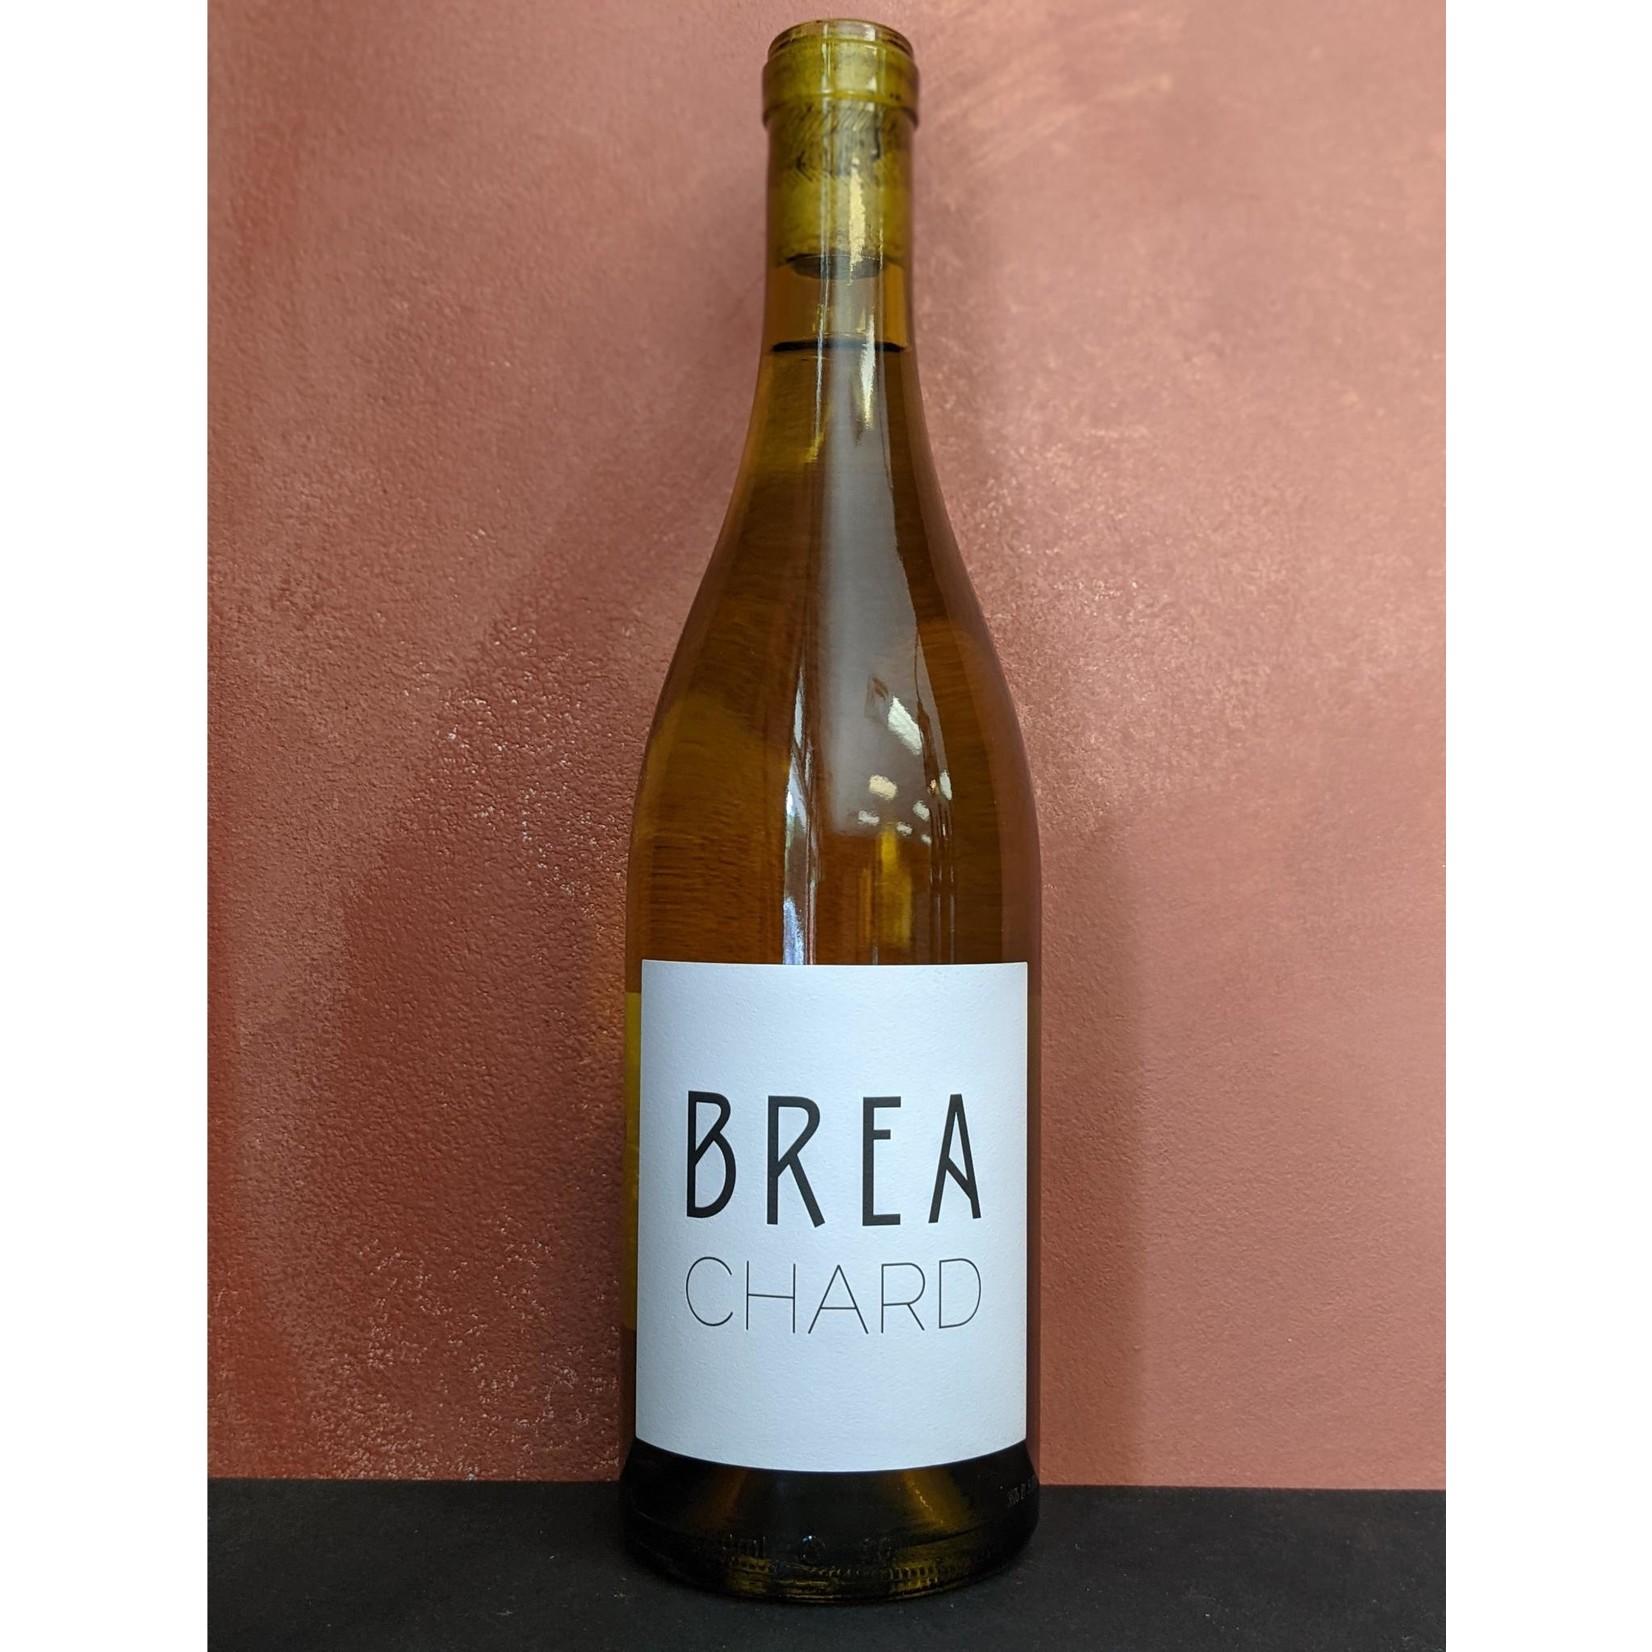 2020 Chardonnay, Brea Wines